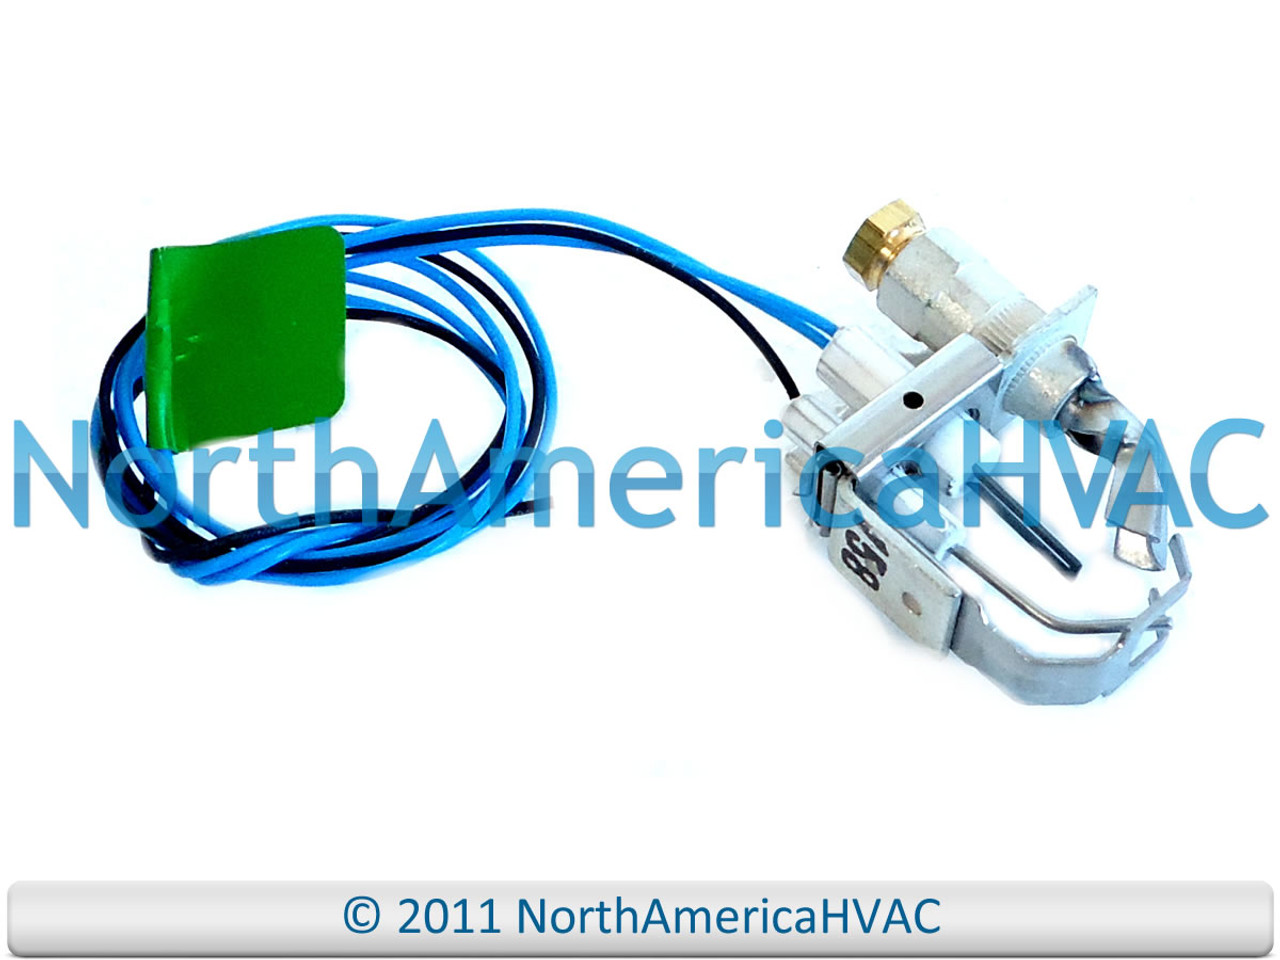 OEM Honeywell Furnace Mini Hot Surface Pilot Ignitor  Q3400A 1008 Q3400A1008